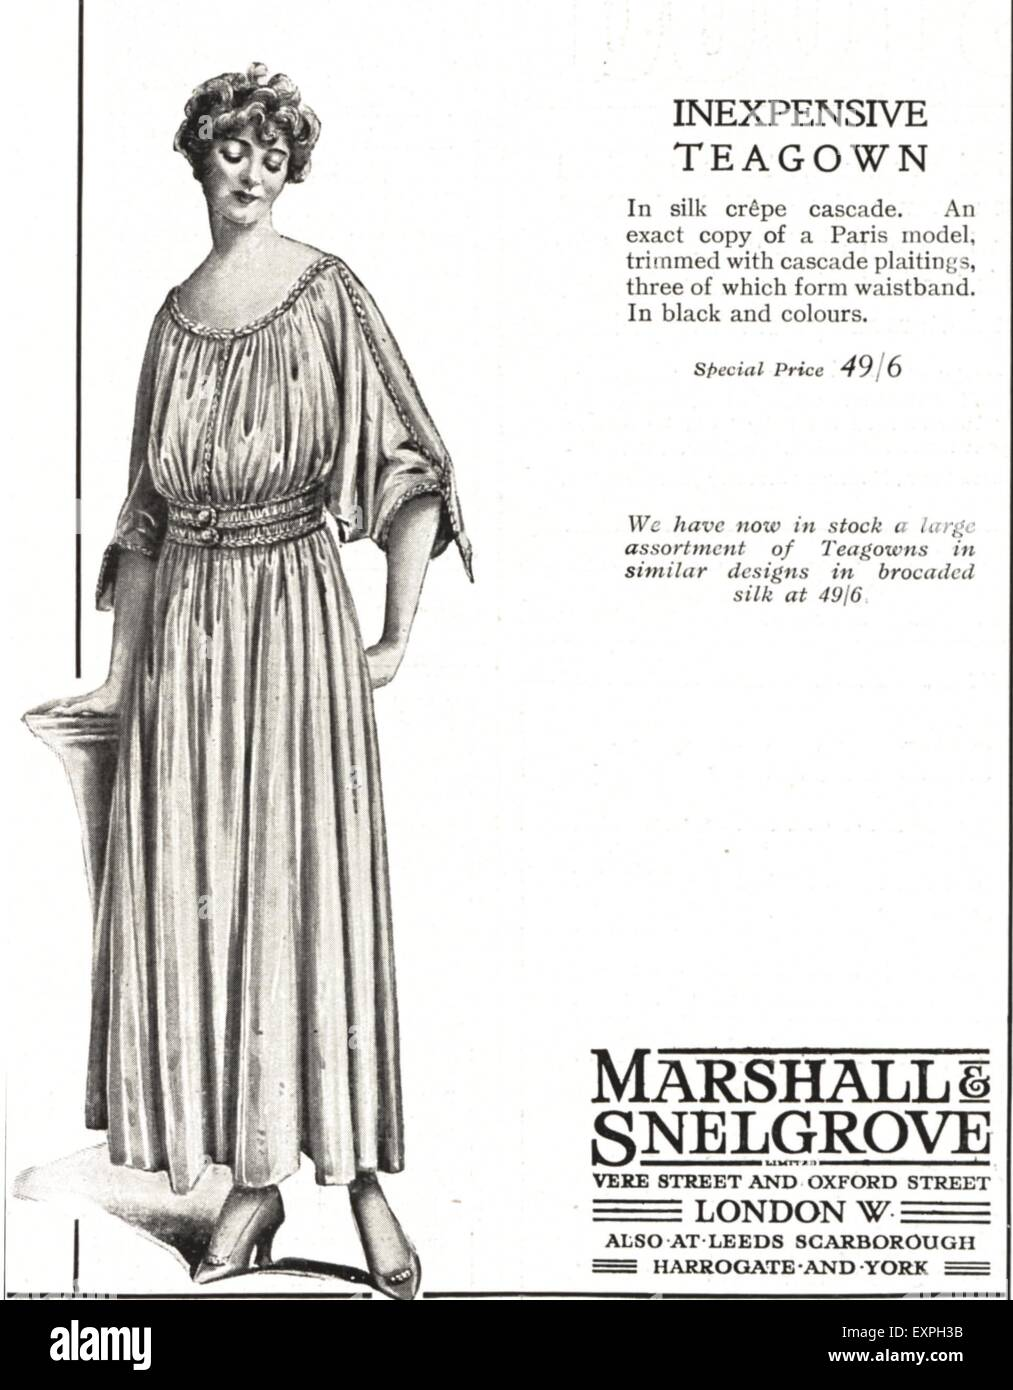 1910s UK Marshall and Snelgrove Magazine Advert - Stock Image